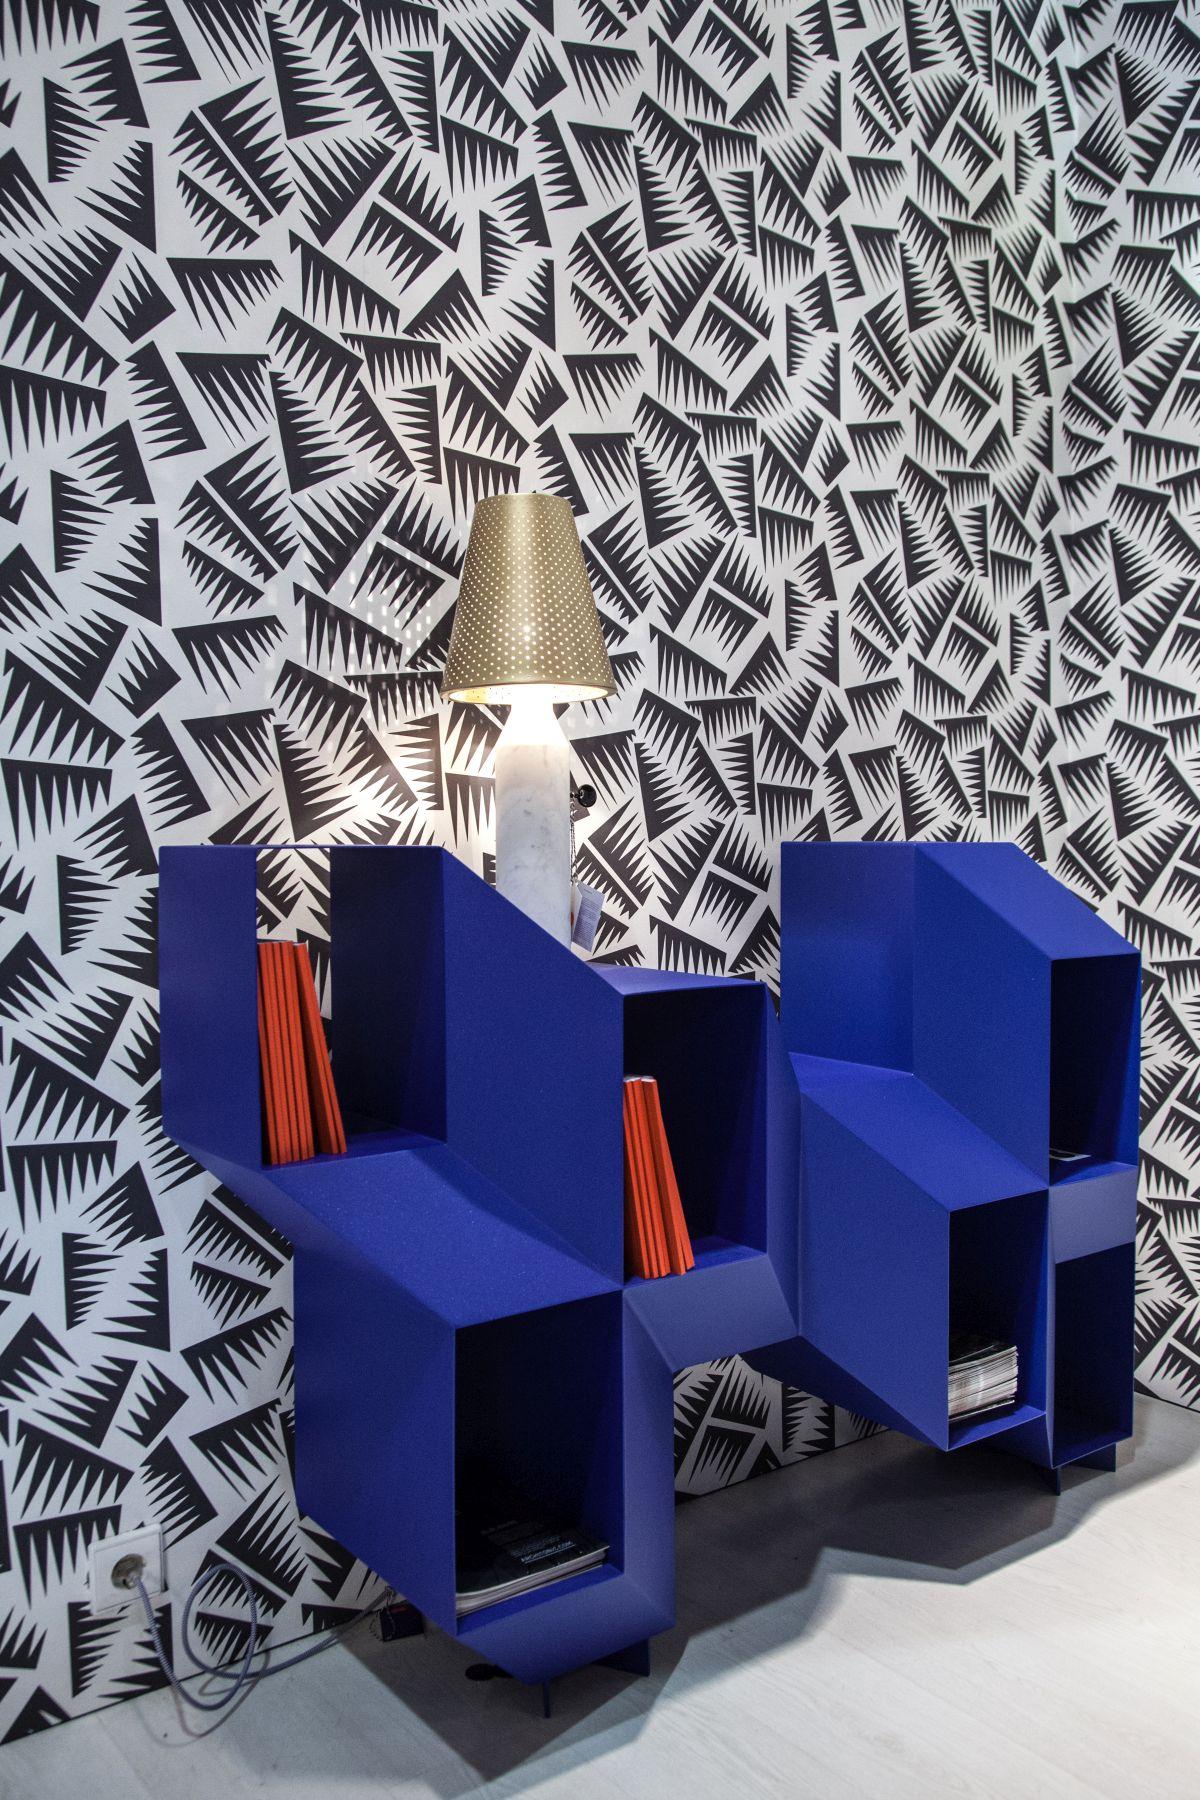 3D bookshelf storage